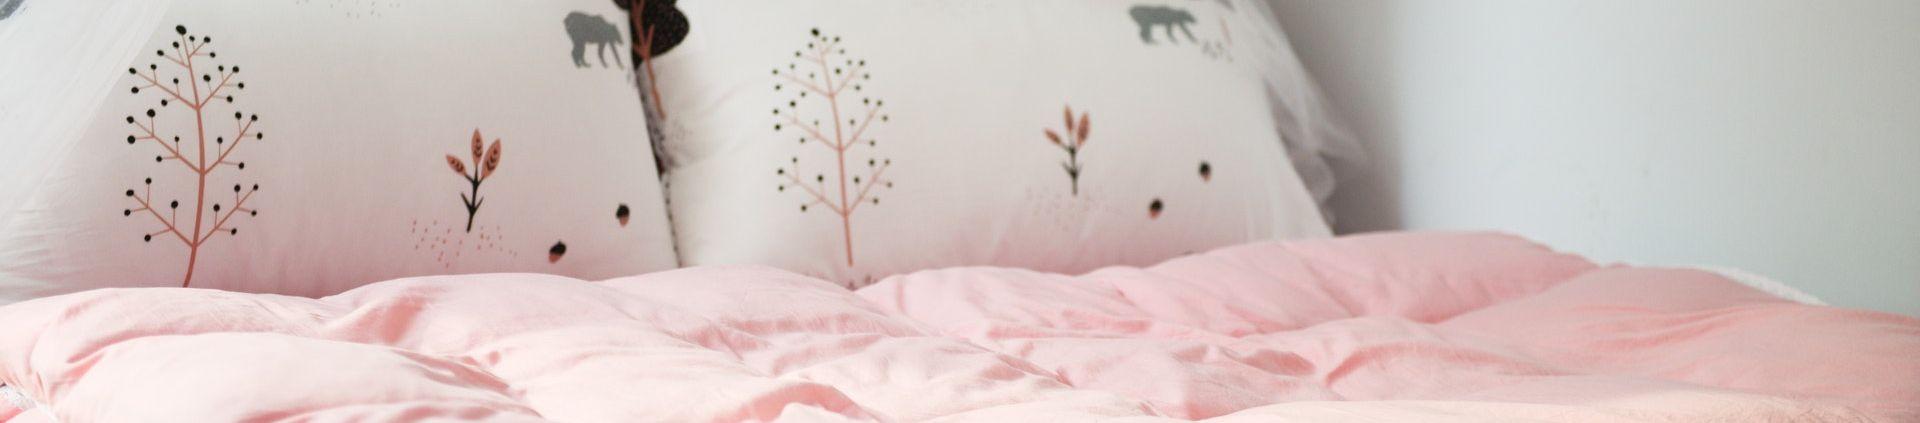 kolorowa sypialnia naglowek